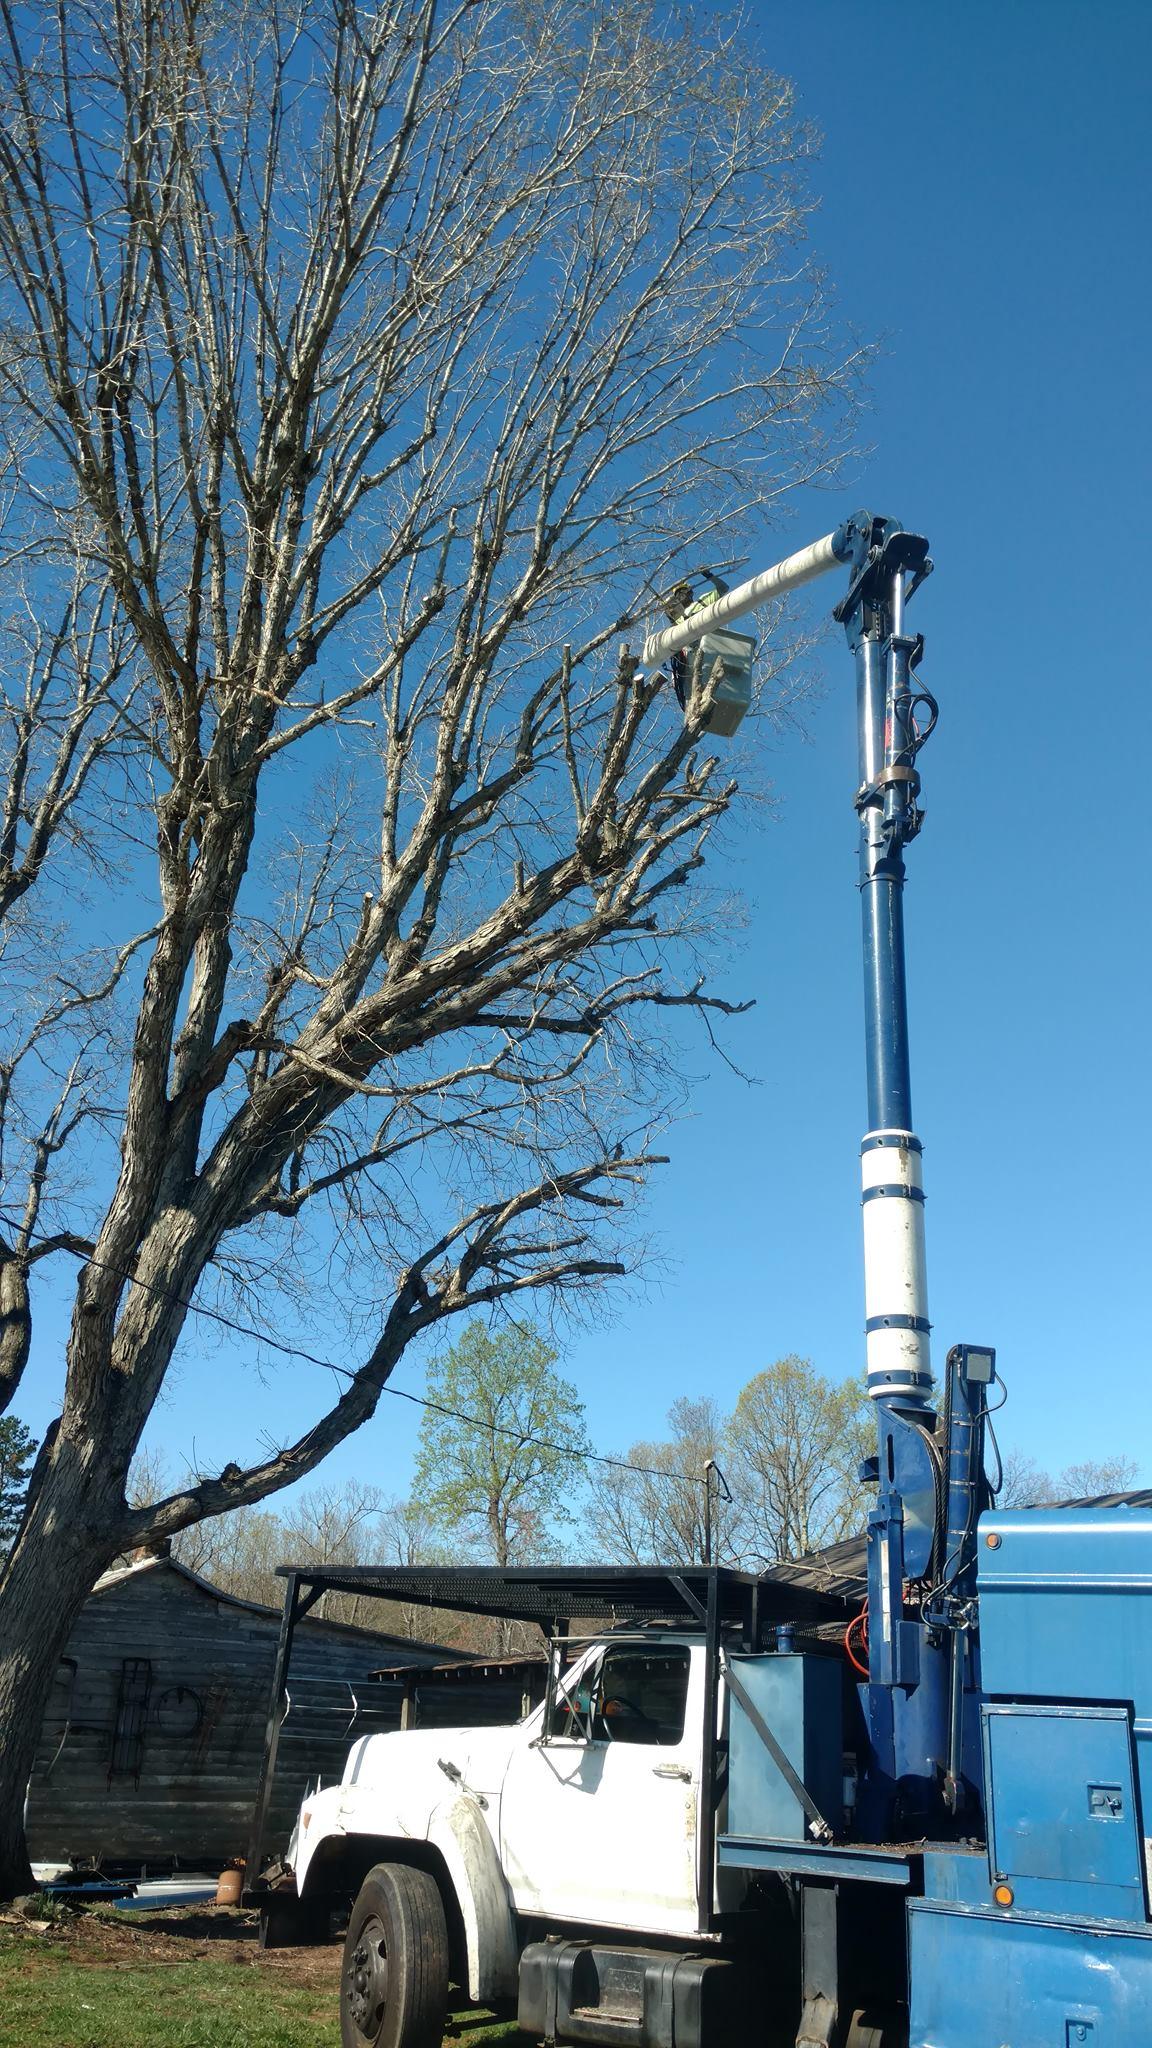 tree-service-Lynchburg-VA-1